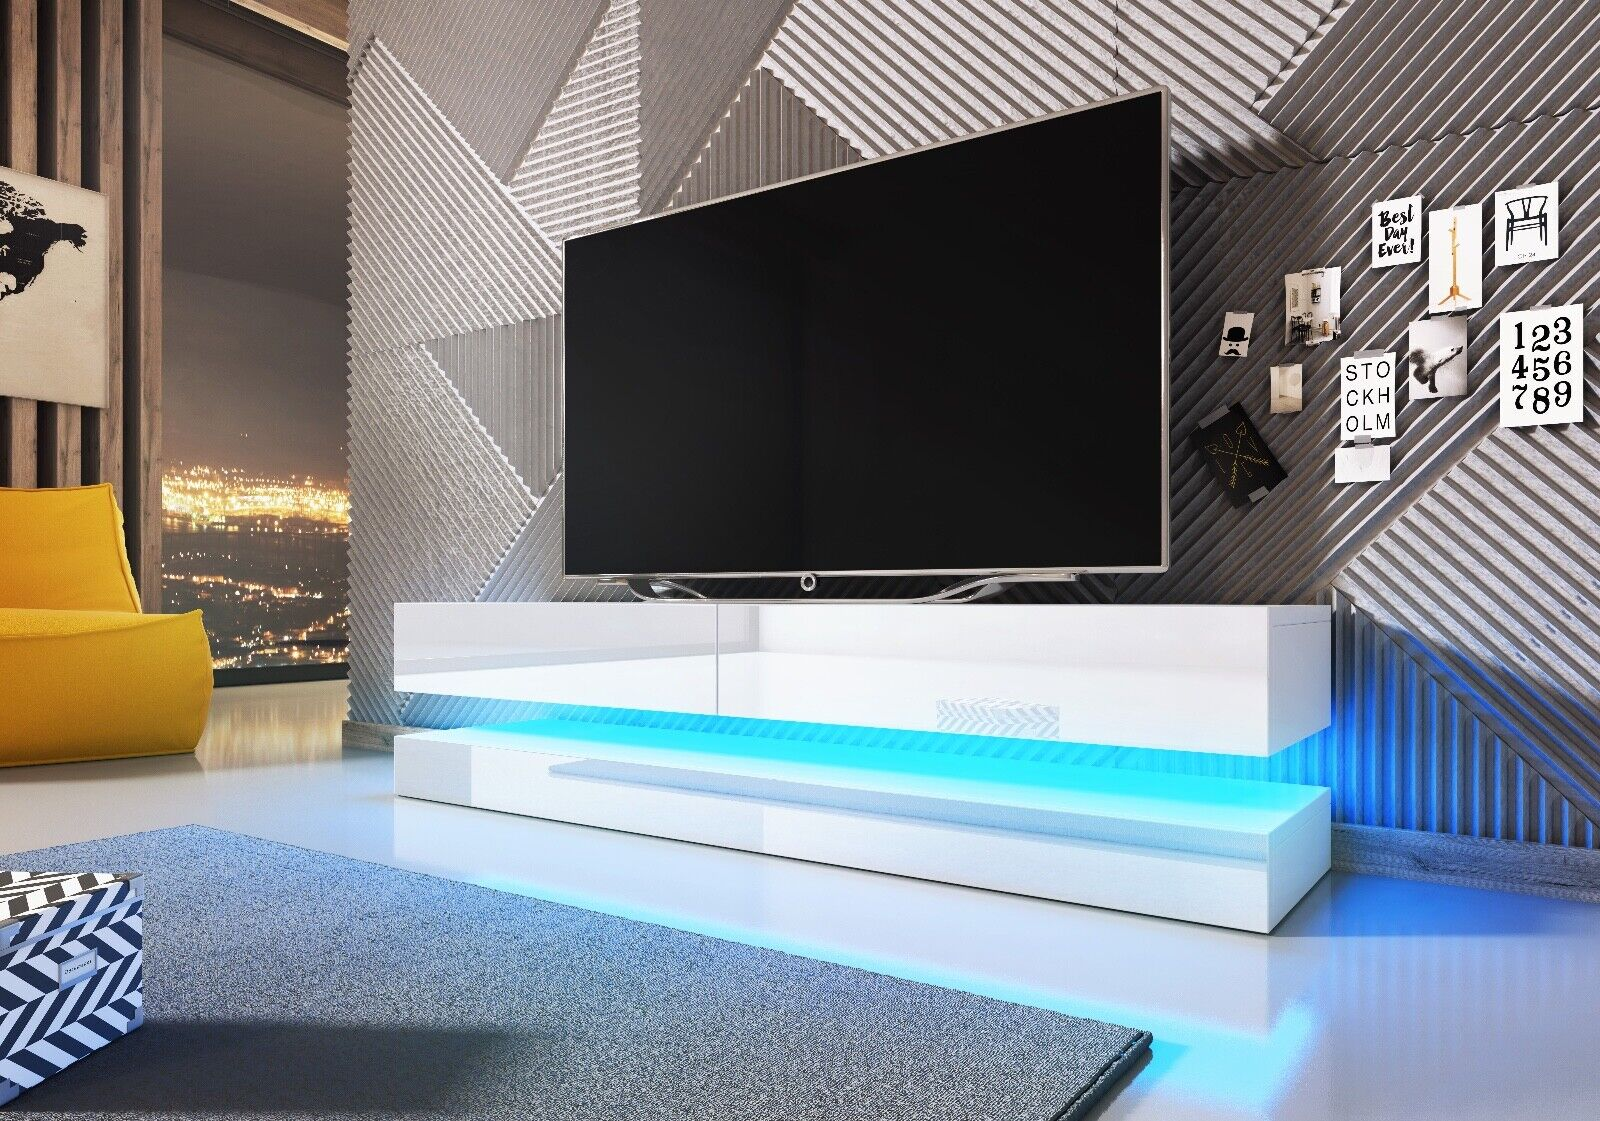 Sideboard Lowboard TV Fernsehschrank FLY 140 cm Kommode inkl LED Highboard NEU